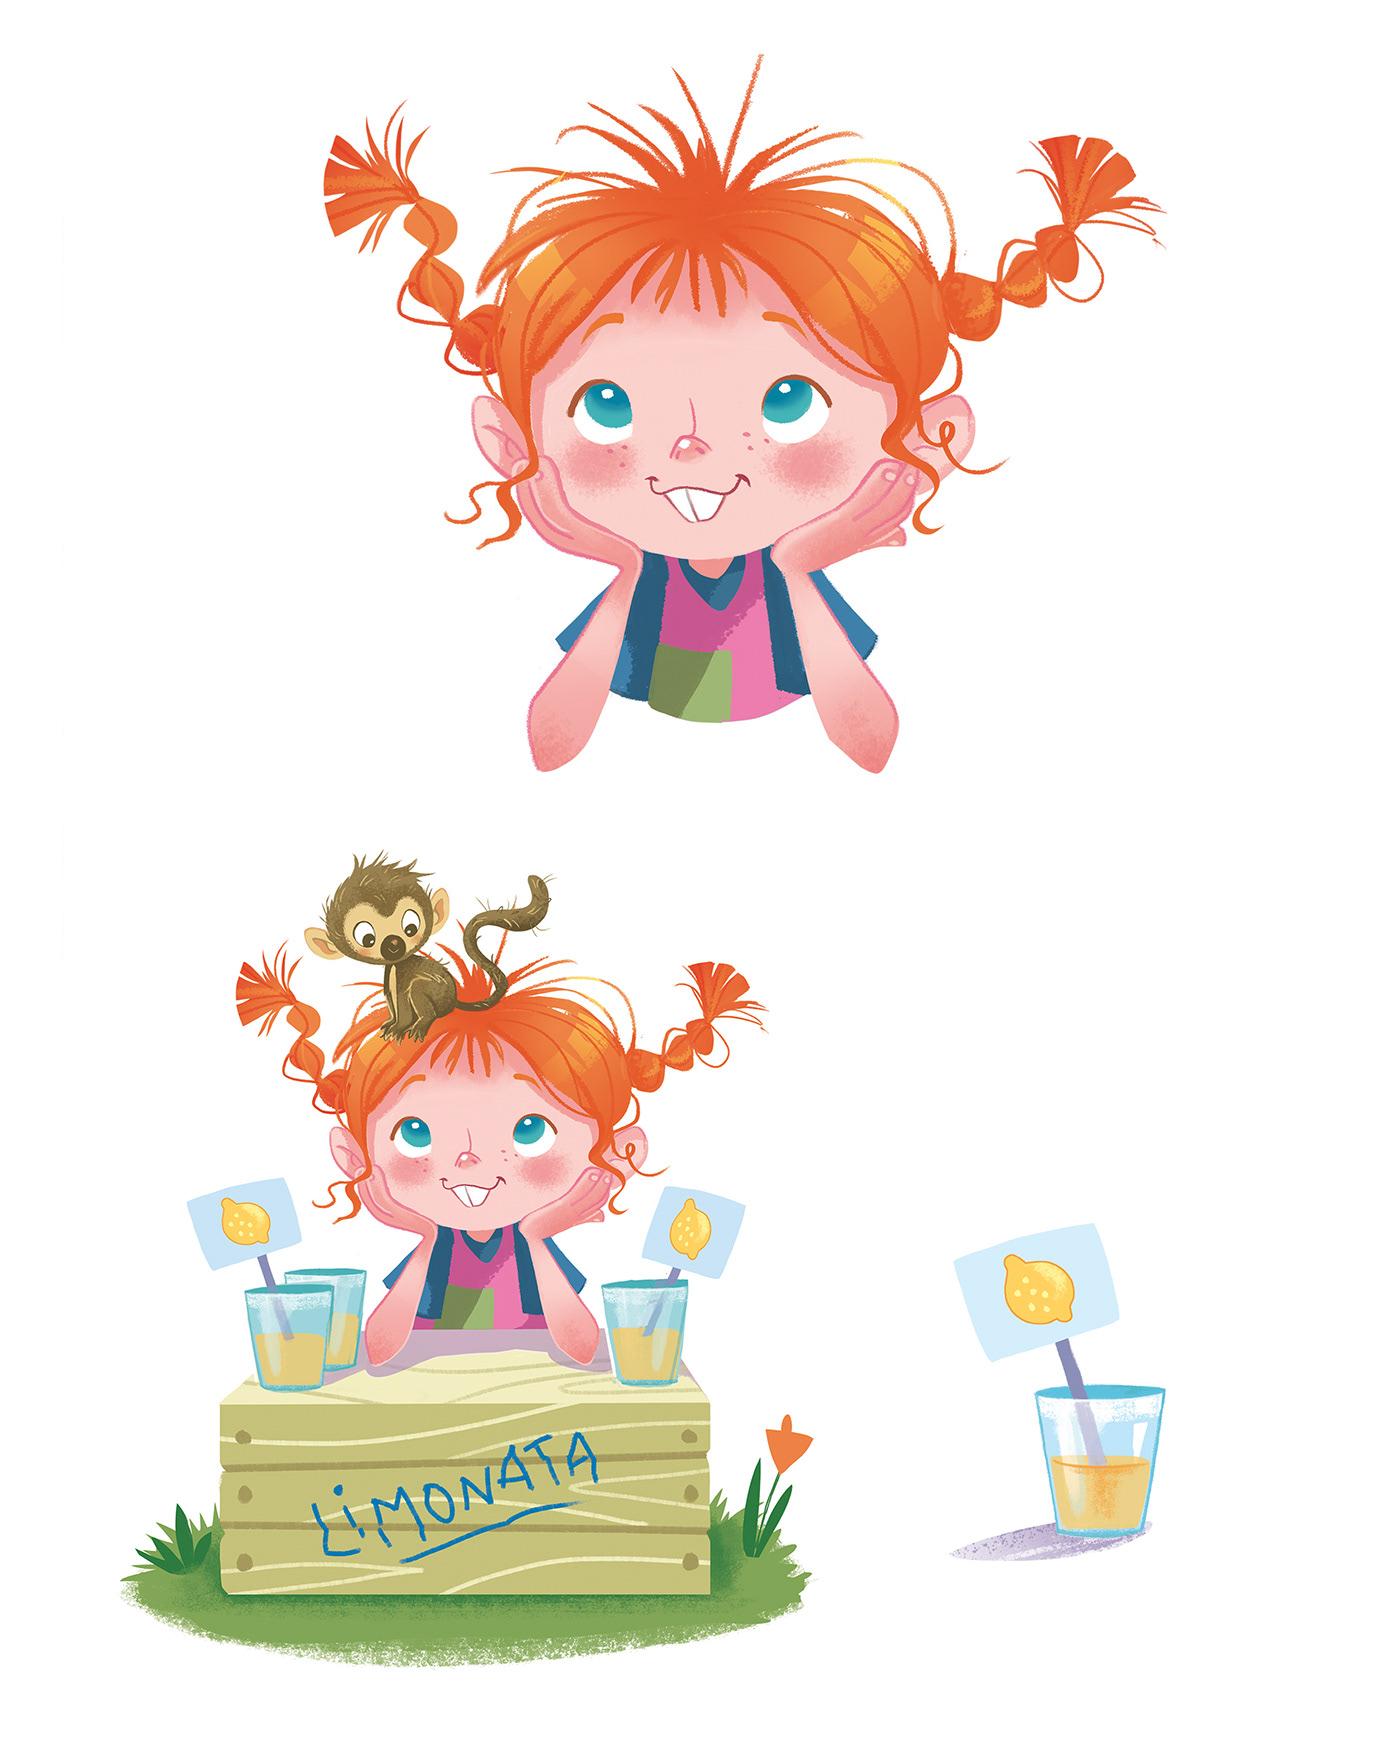 ILLUSTRATION  Character design  inspiration inspire cute children Drawing  digital paint pattern illustrazione